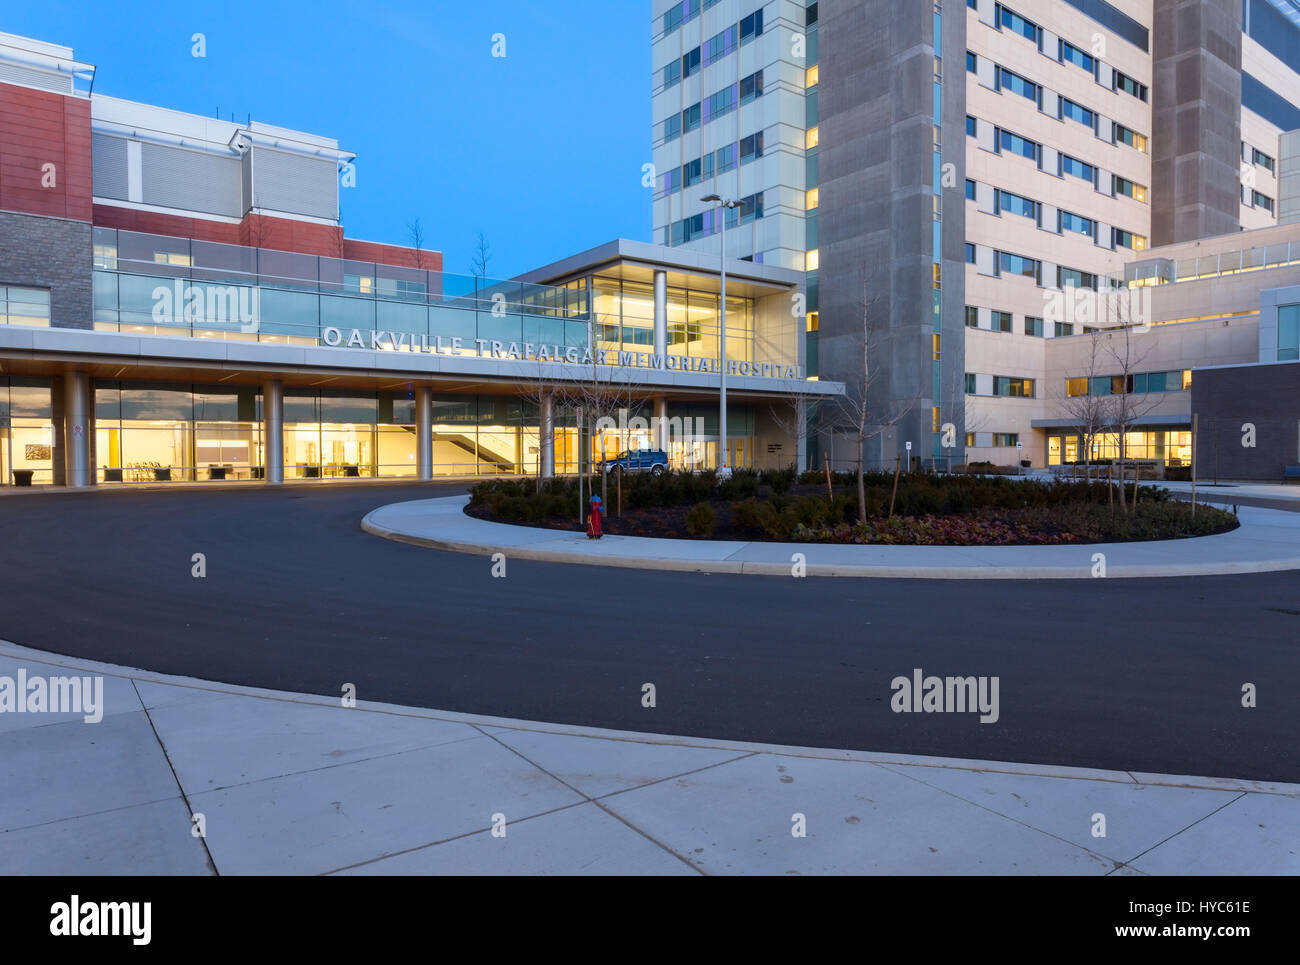 The main entrance to the Oakville Trafalgar Memorial Hospital in Oakville, Ontario, Canada. - Stock Image